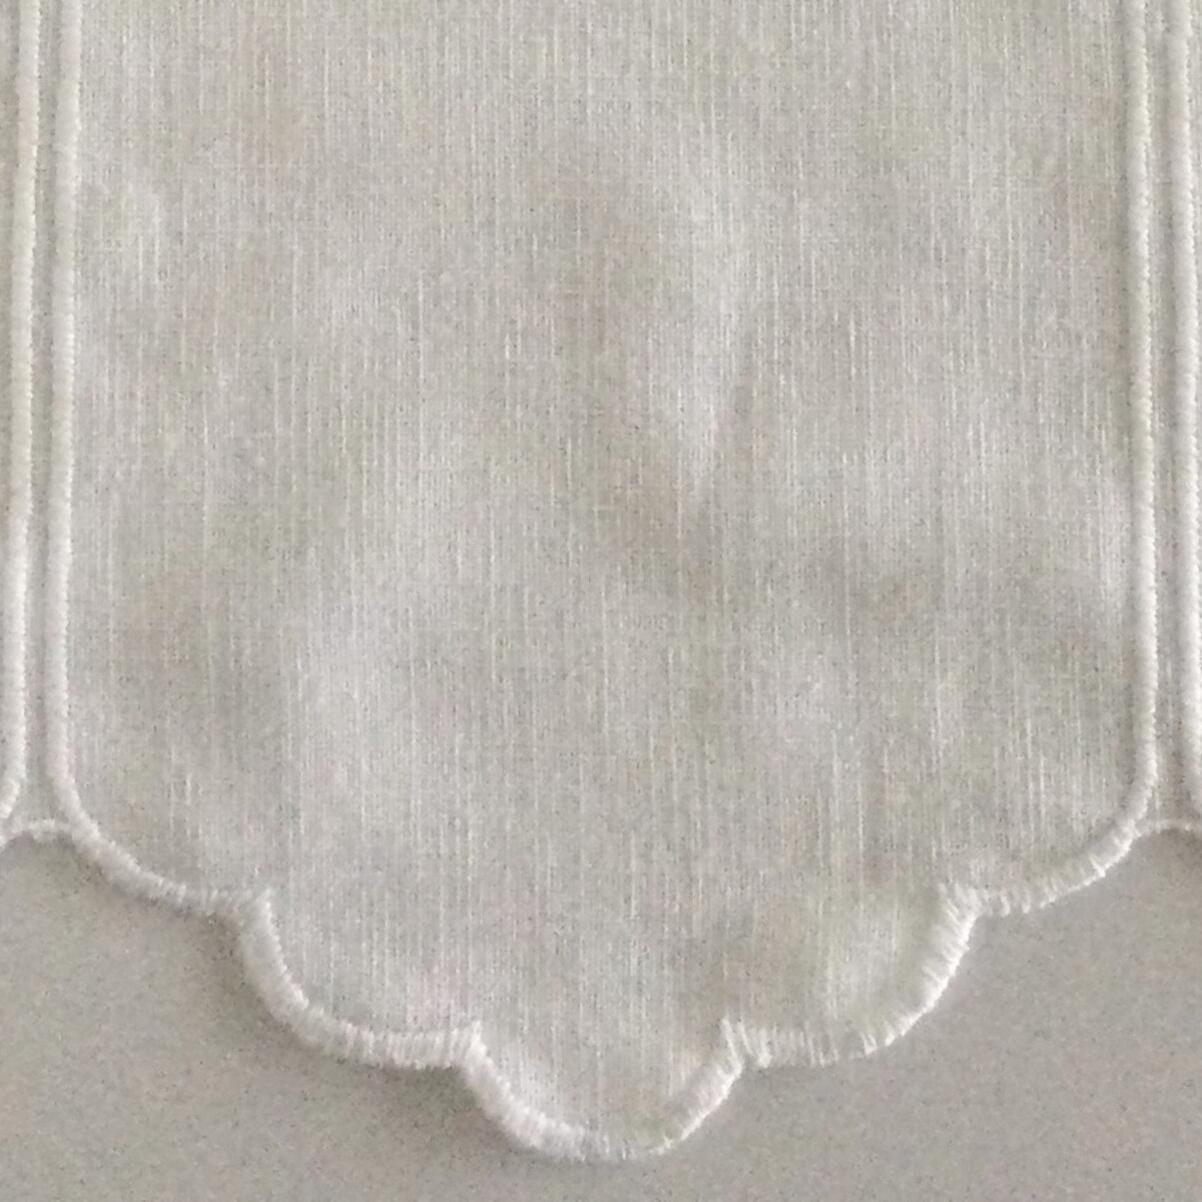 Tessuto al taglio Tirolese bianco 0.01 cm - 3